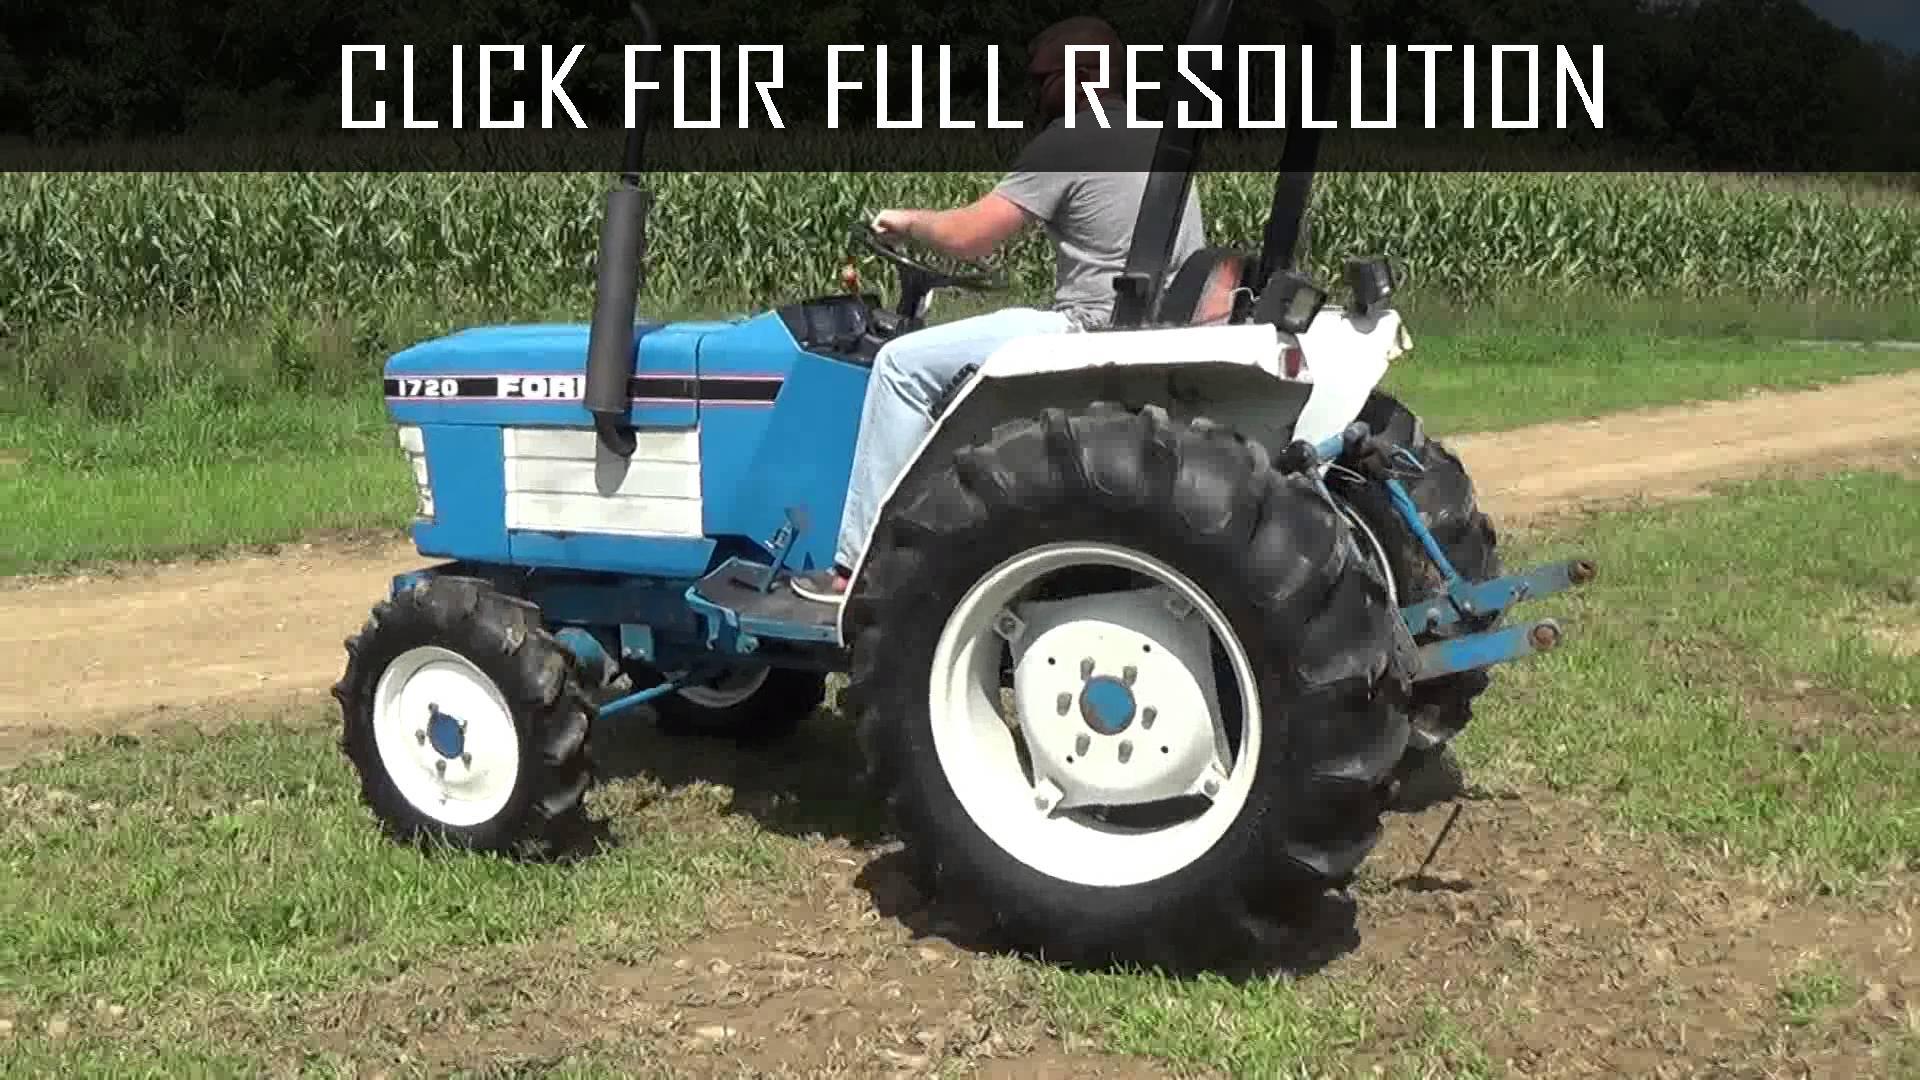 Ford 1715 Tractor Manual Wiring Diagram Array 1720 Farm Tractors Rh Tractorhd Mobi